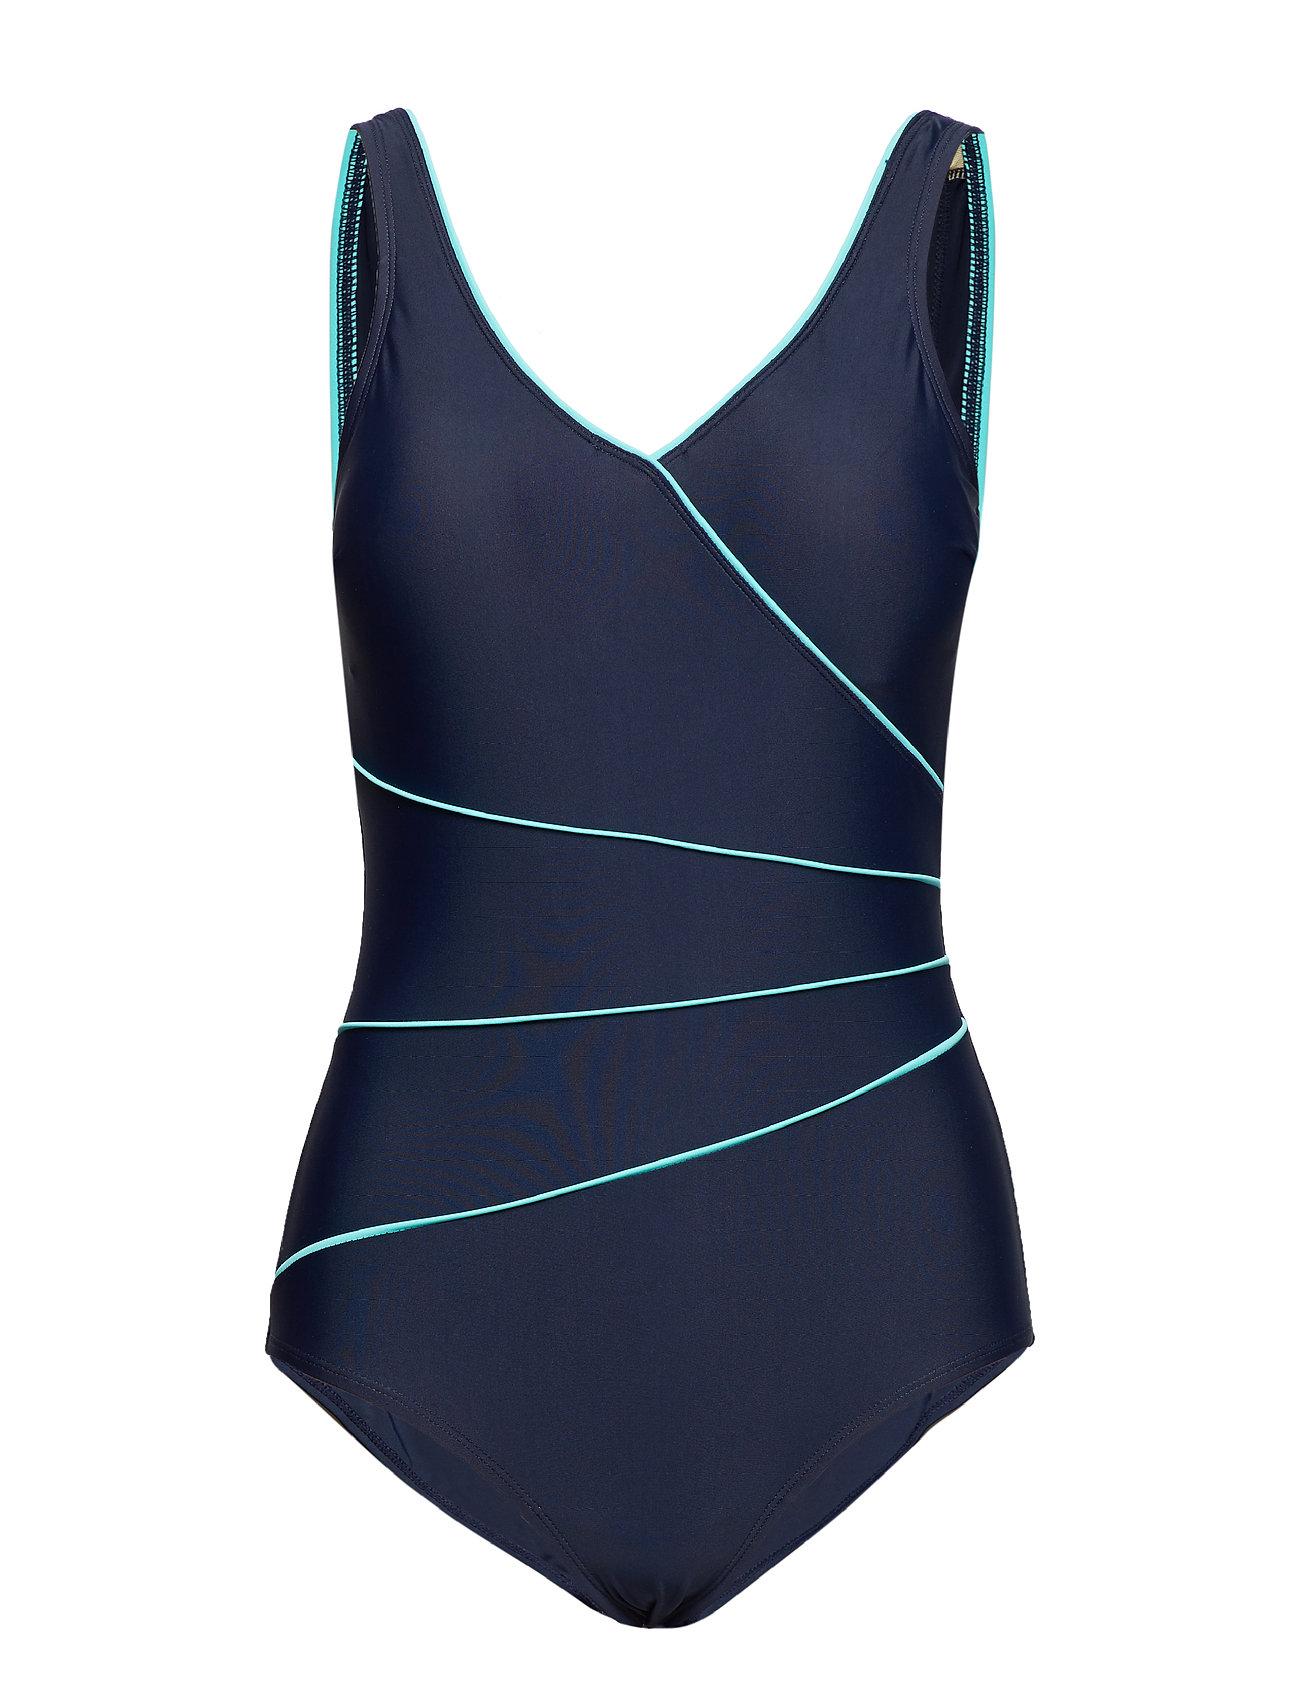 Wiki Swimsuit Daniella Classic - NAVY/AQUA